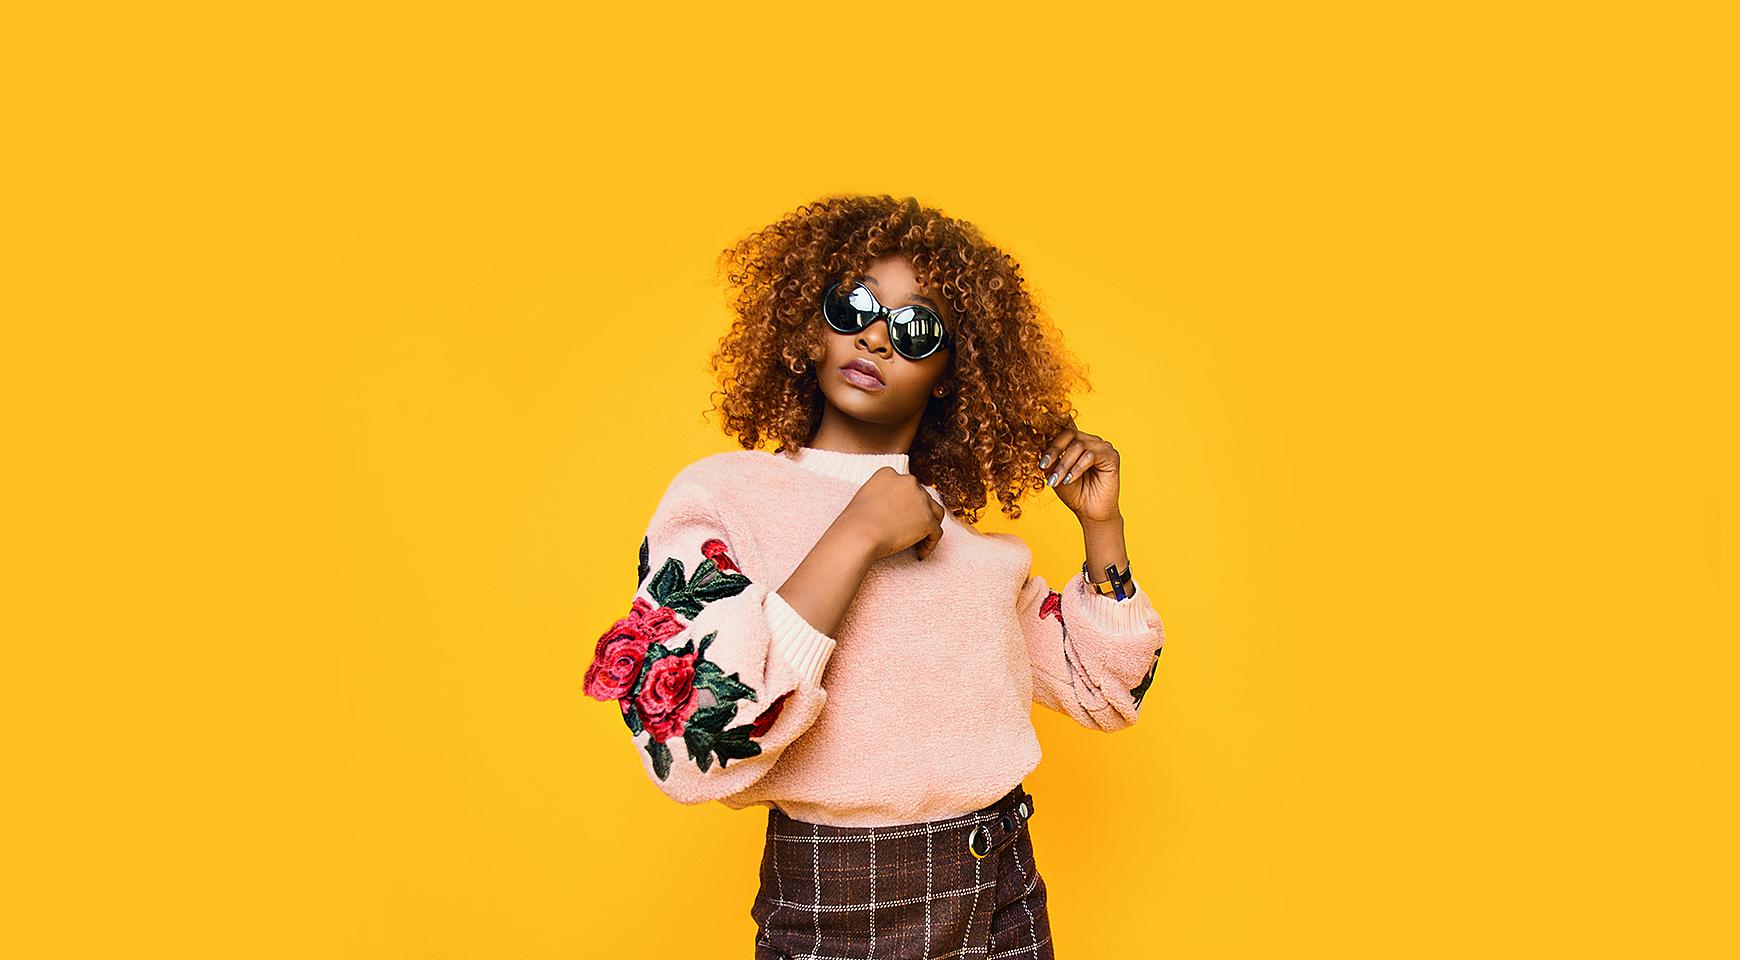 10 Best Fashion Website Design Examples